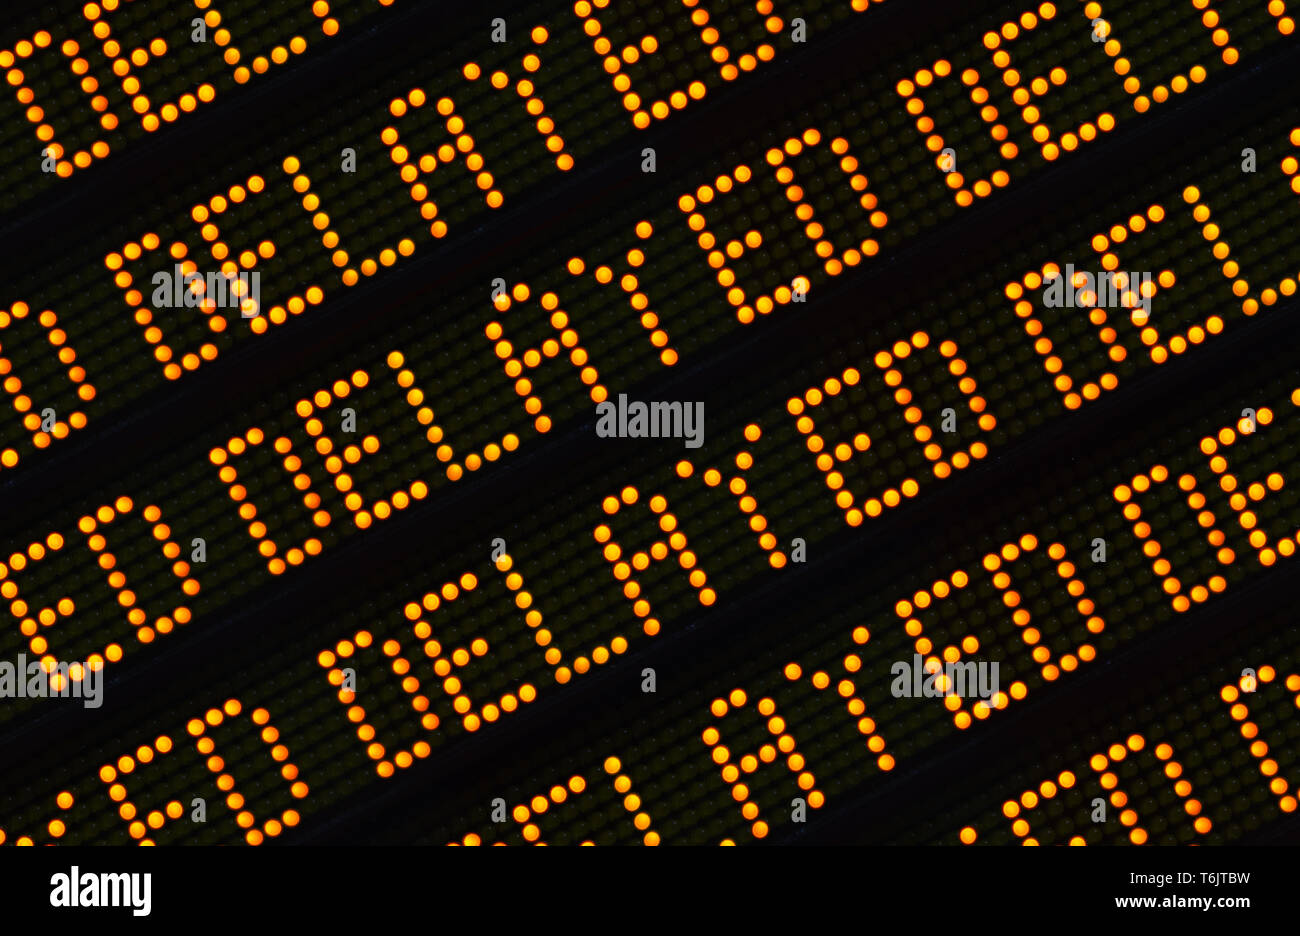 Delayed Sign Closeup - Stock Image